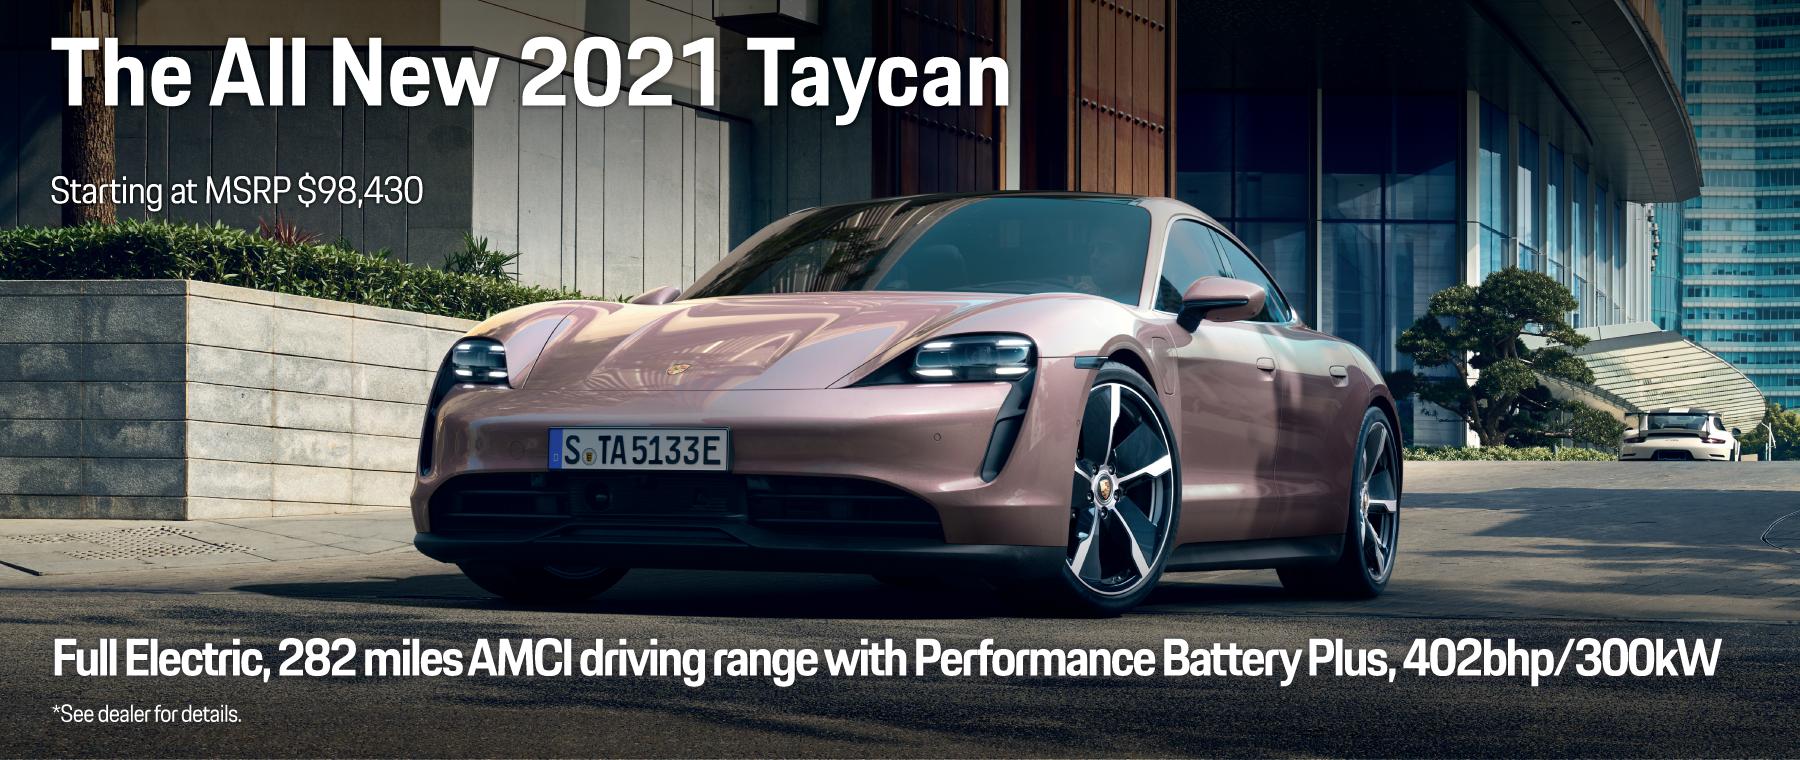 0621-PorscheSpecials-New-TAYCAN-DESKTOP